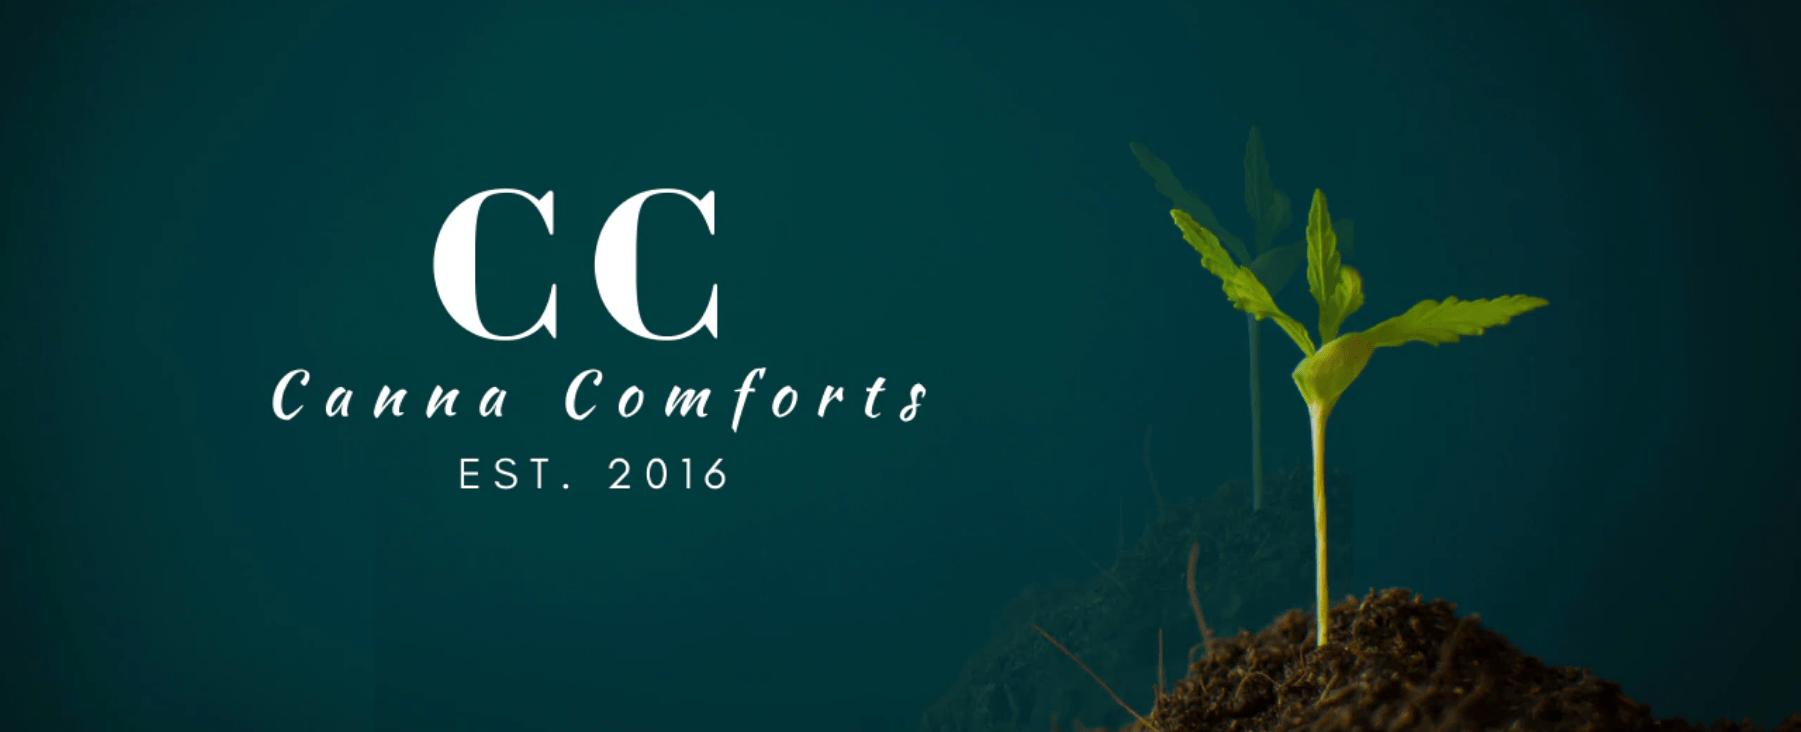 Canna Comforts CBD Coupon Code Our Establishment